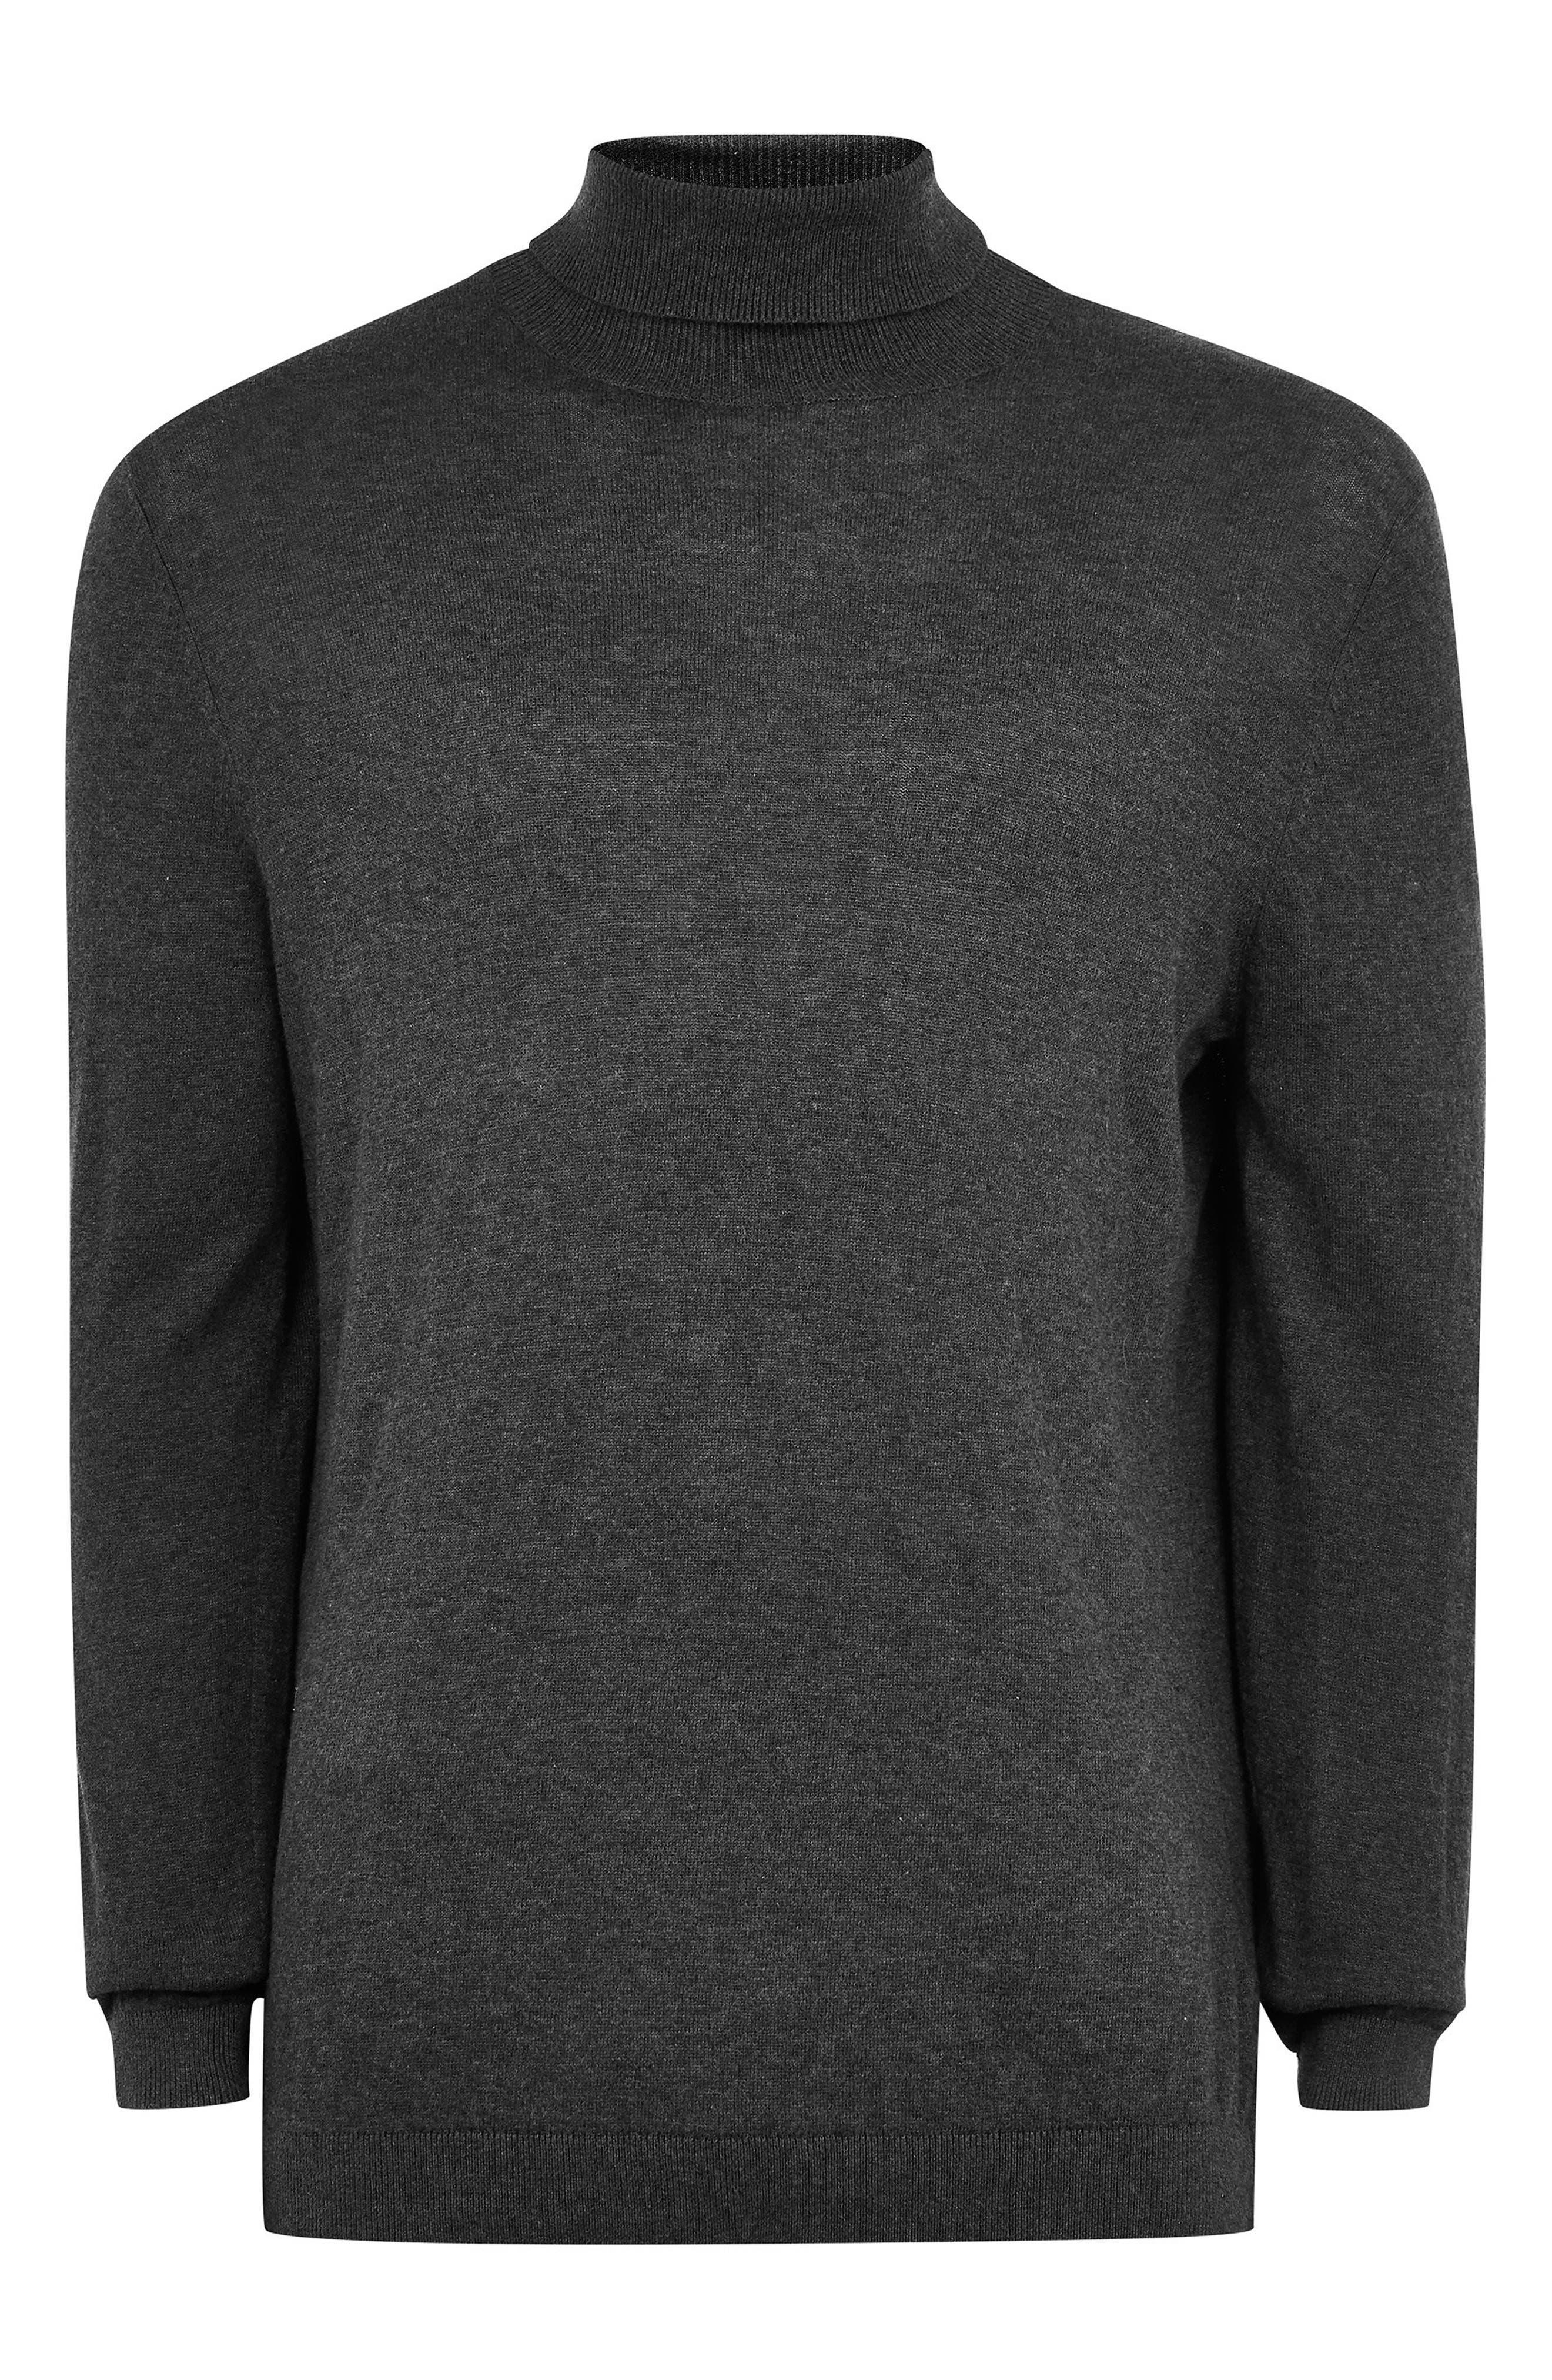 Classic Fit Turtleneck Sweater,                             Alternate thumbnail 4, color,                             DARK GREY